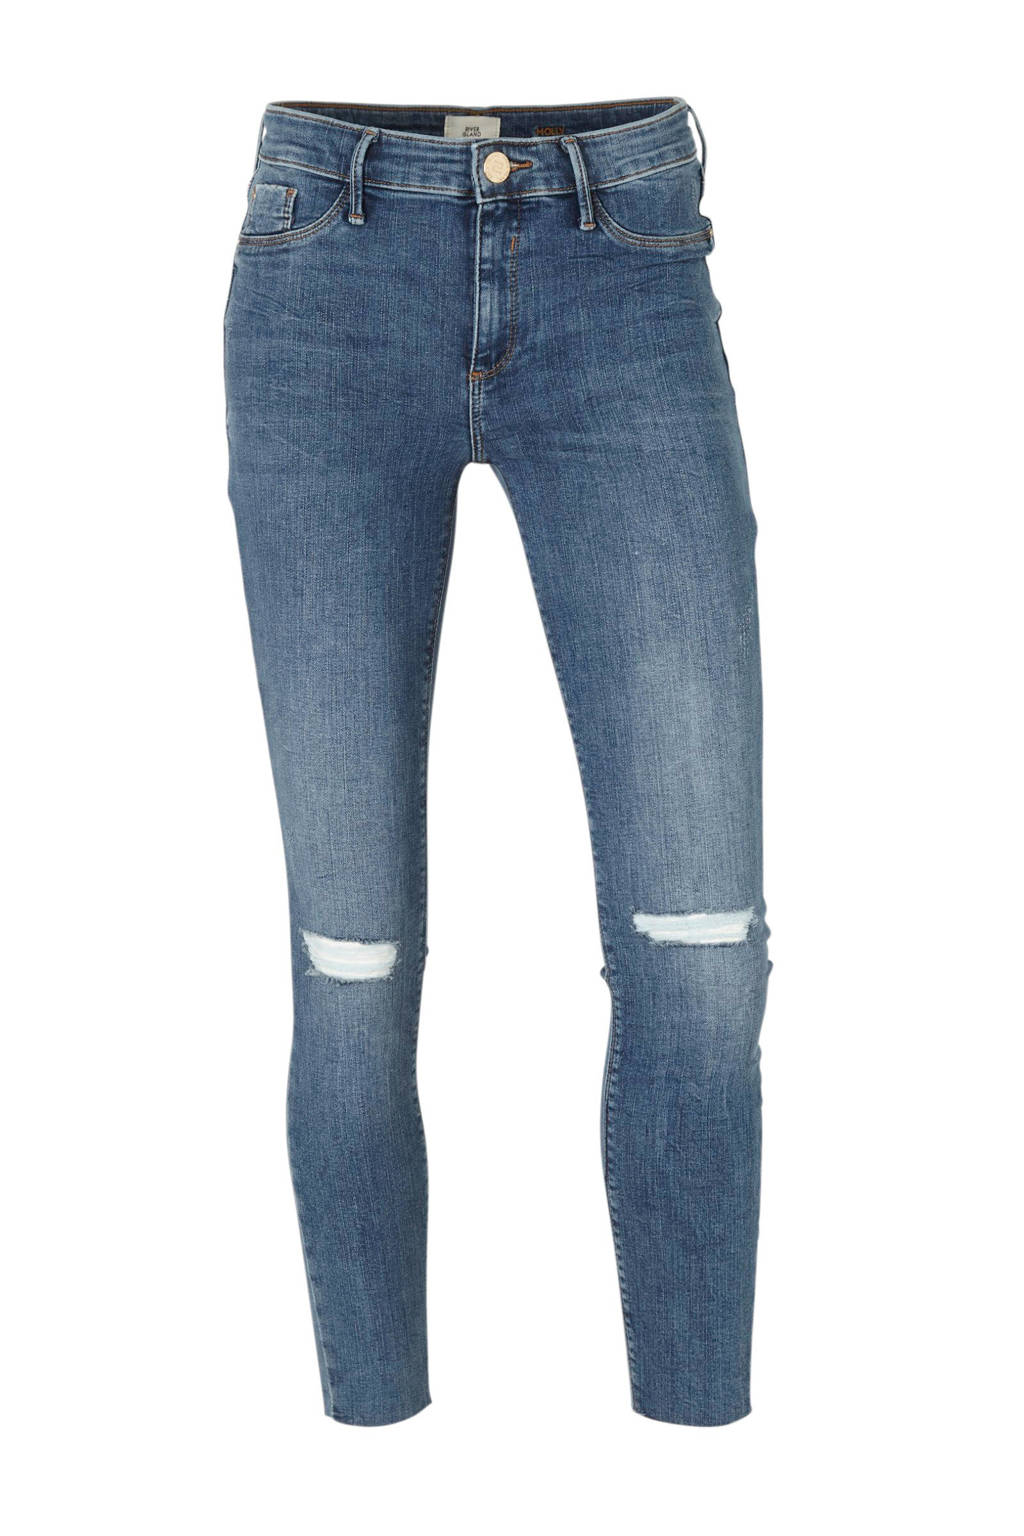 River Island Molly mid rise skinny jeans blauw, Blauw